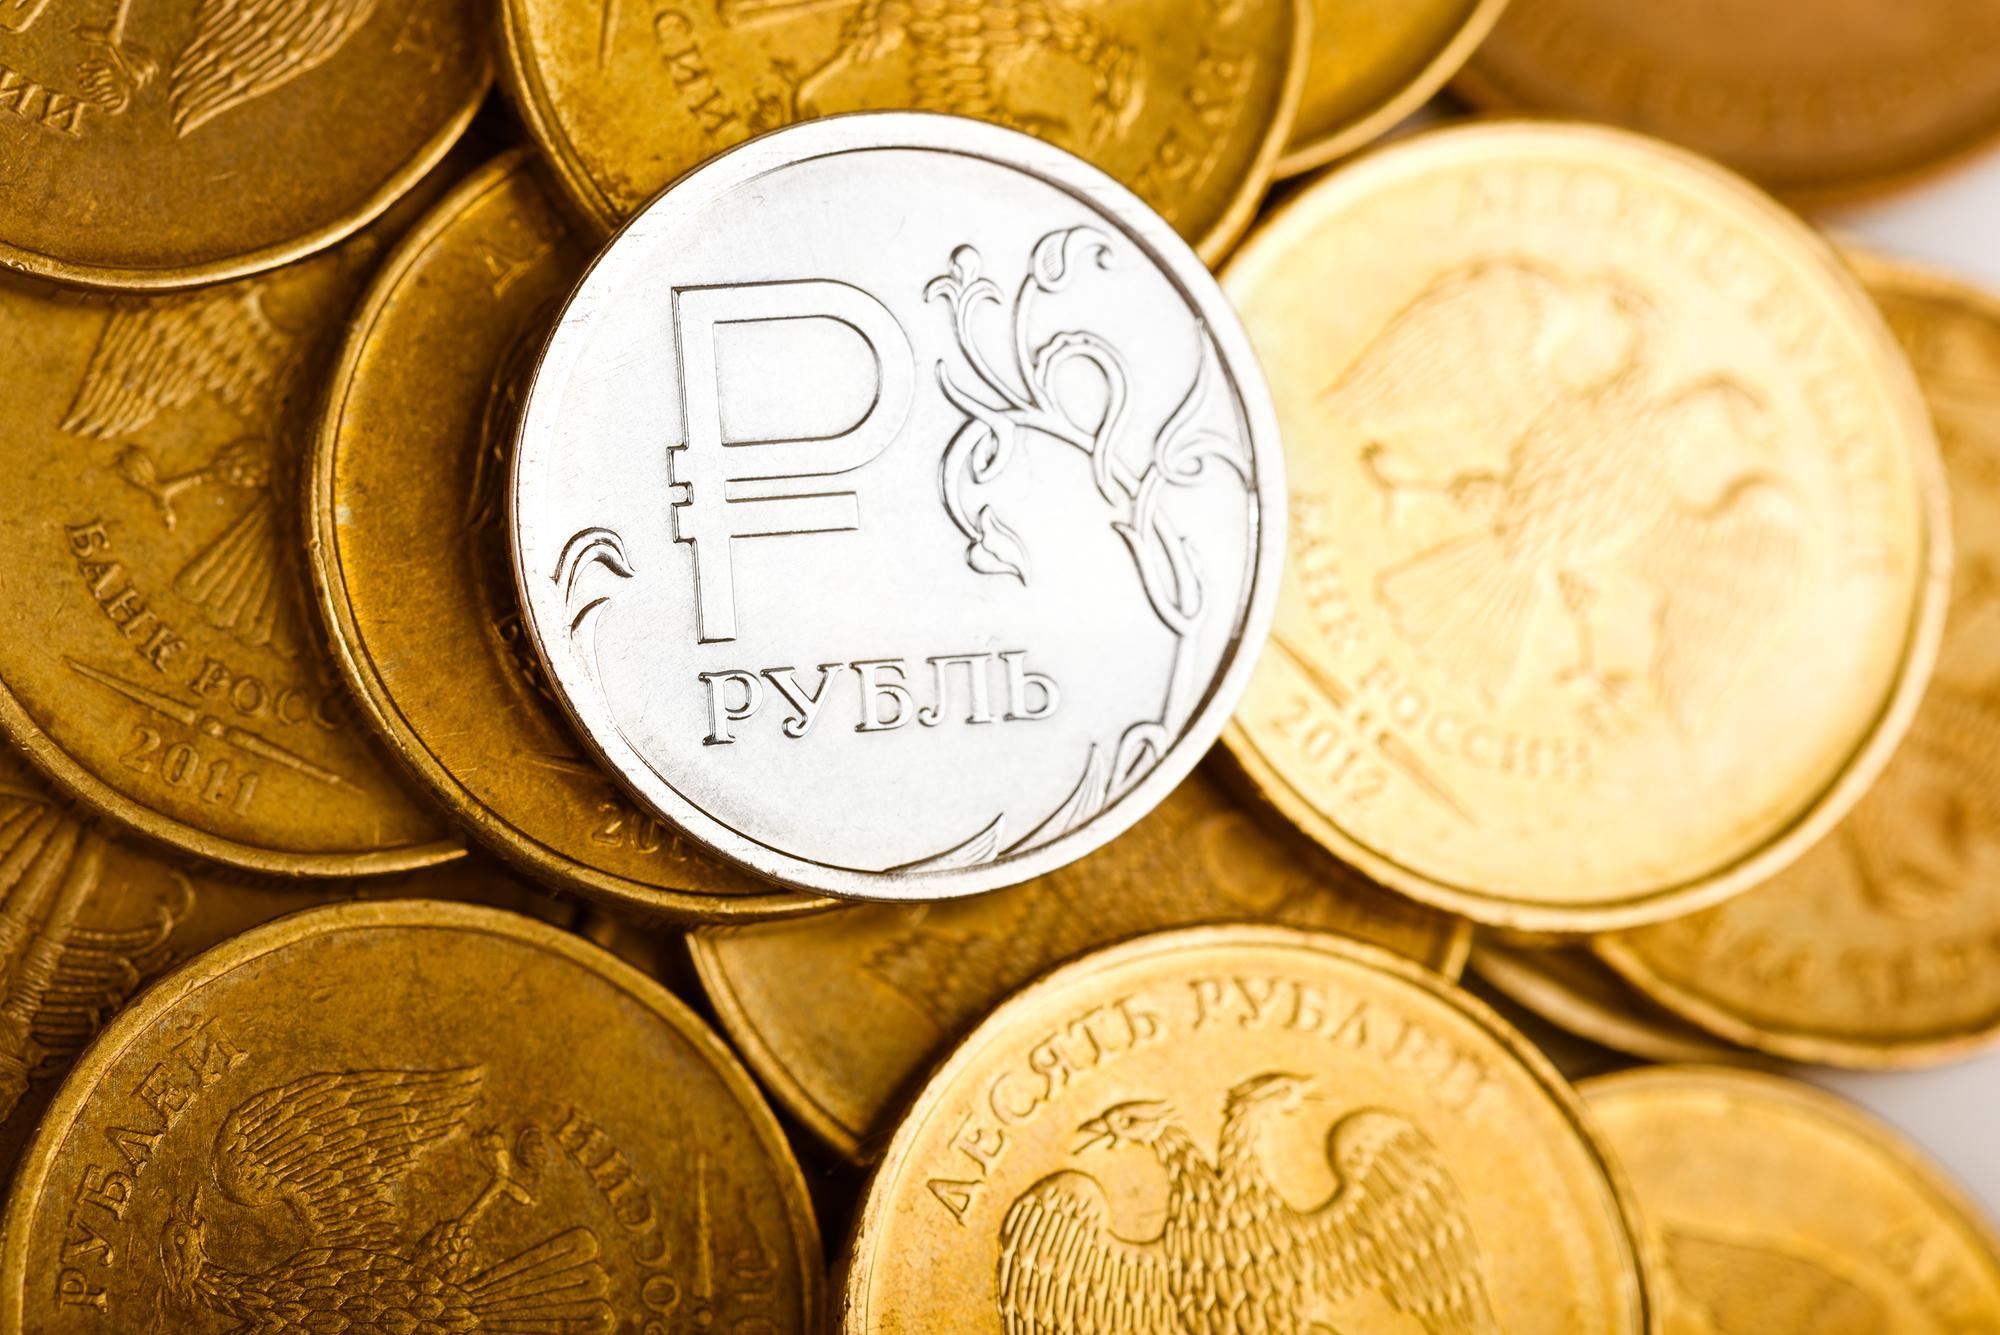 Бюджет Омска подрос почти на миллиард #Новости #Общество #Омск